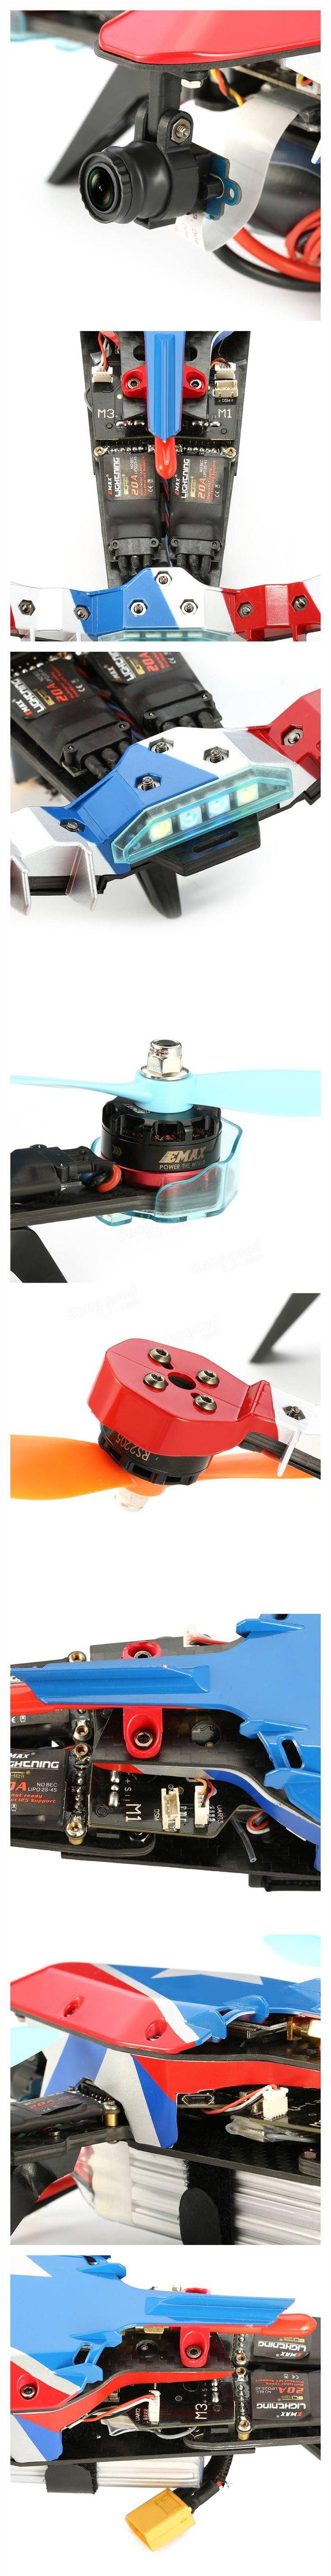 Eachine V-tail 210 FPV Drone 1080P DVR F3 EVO Flight Controller 5.8G 40CH 200mW OSD ARF(20% off coupon:VARF)